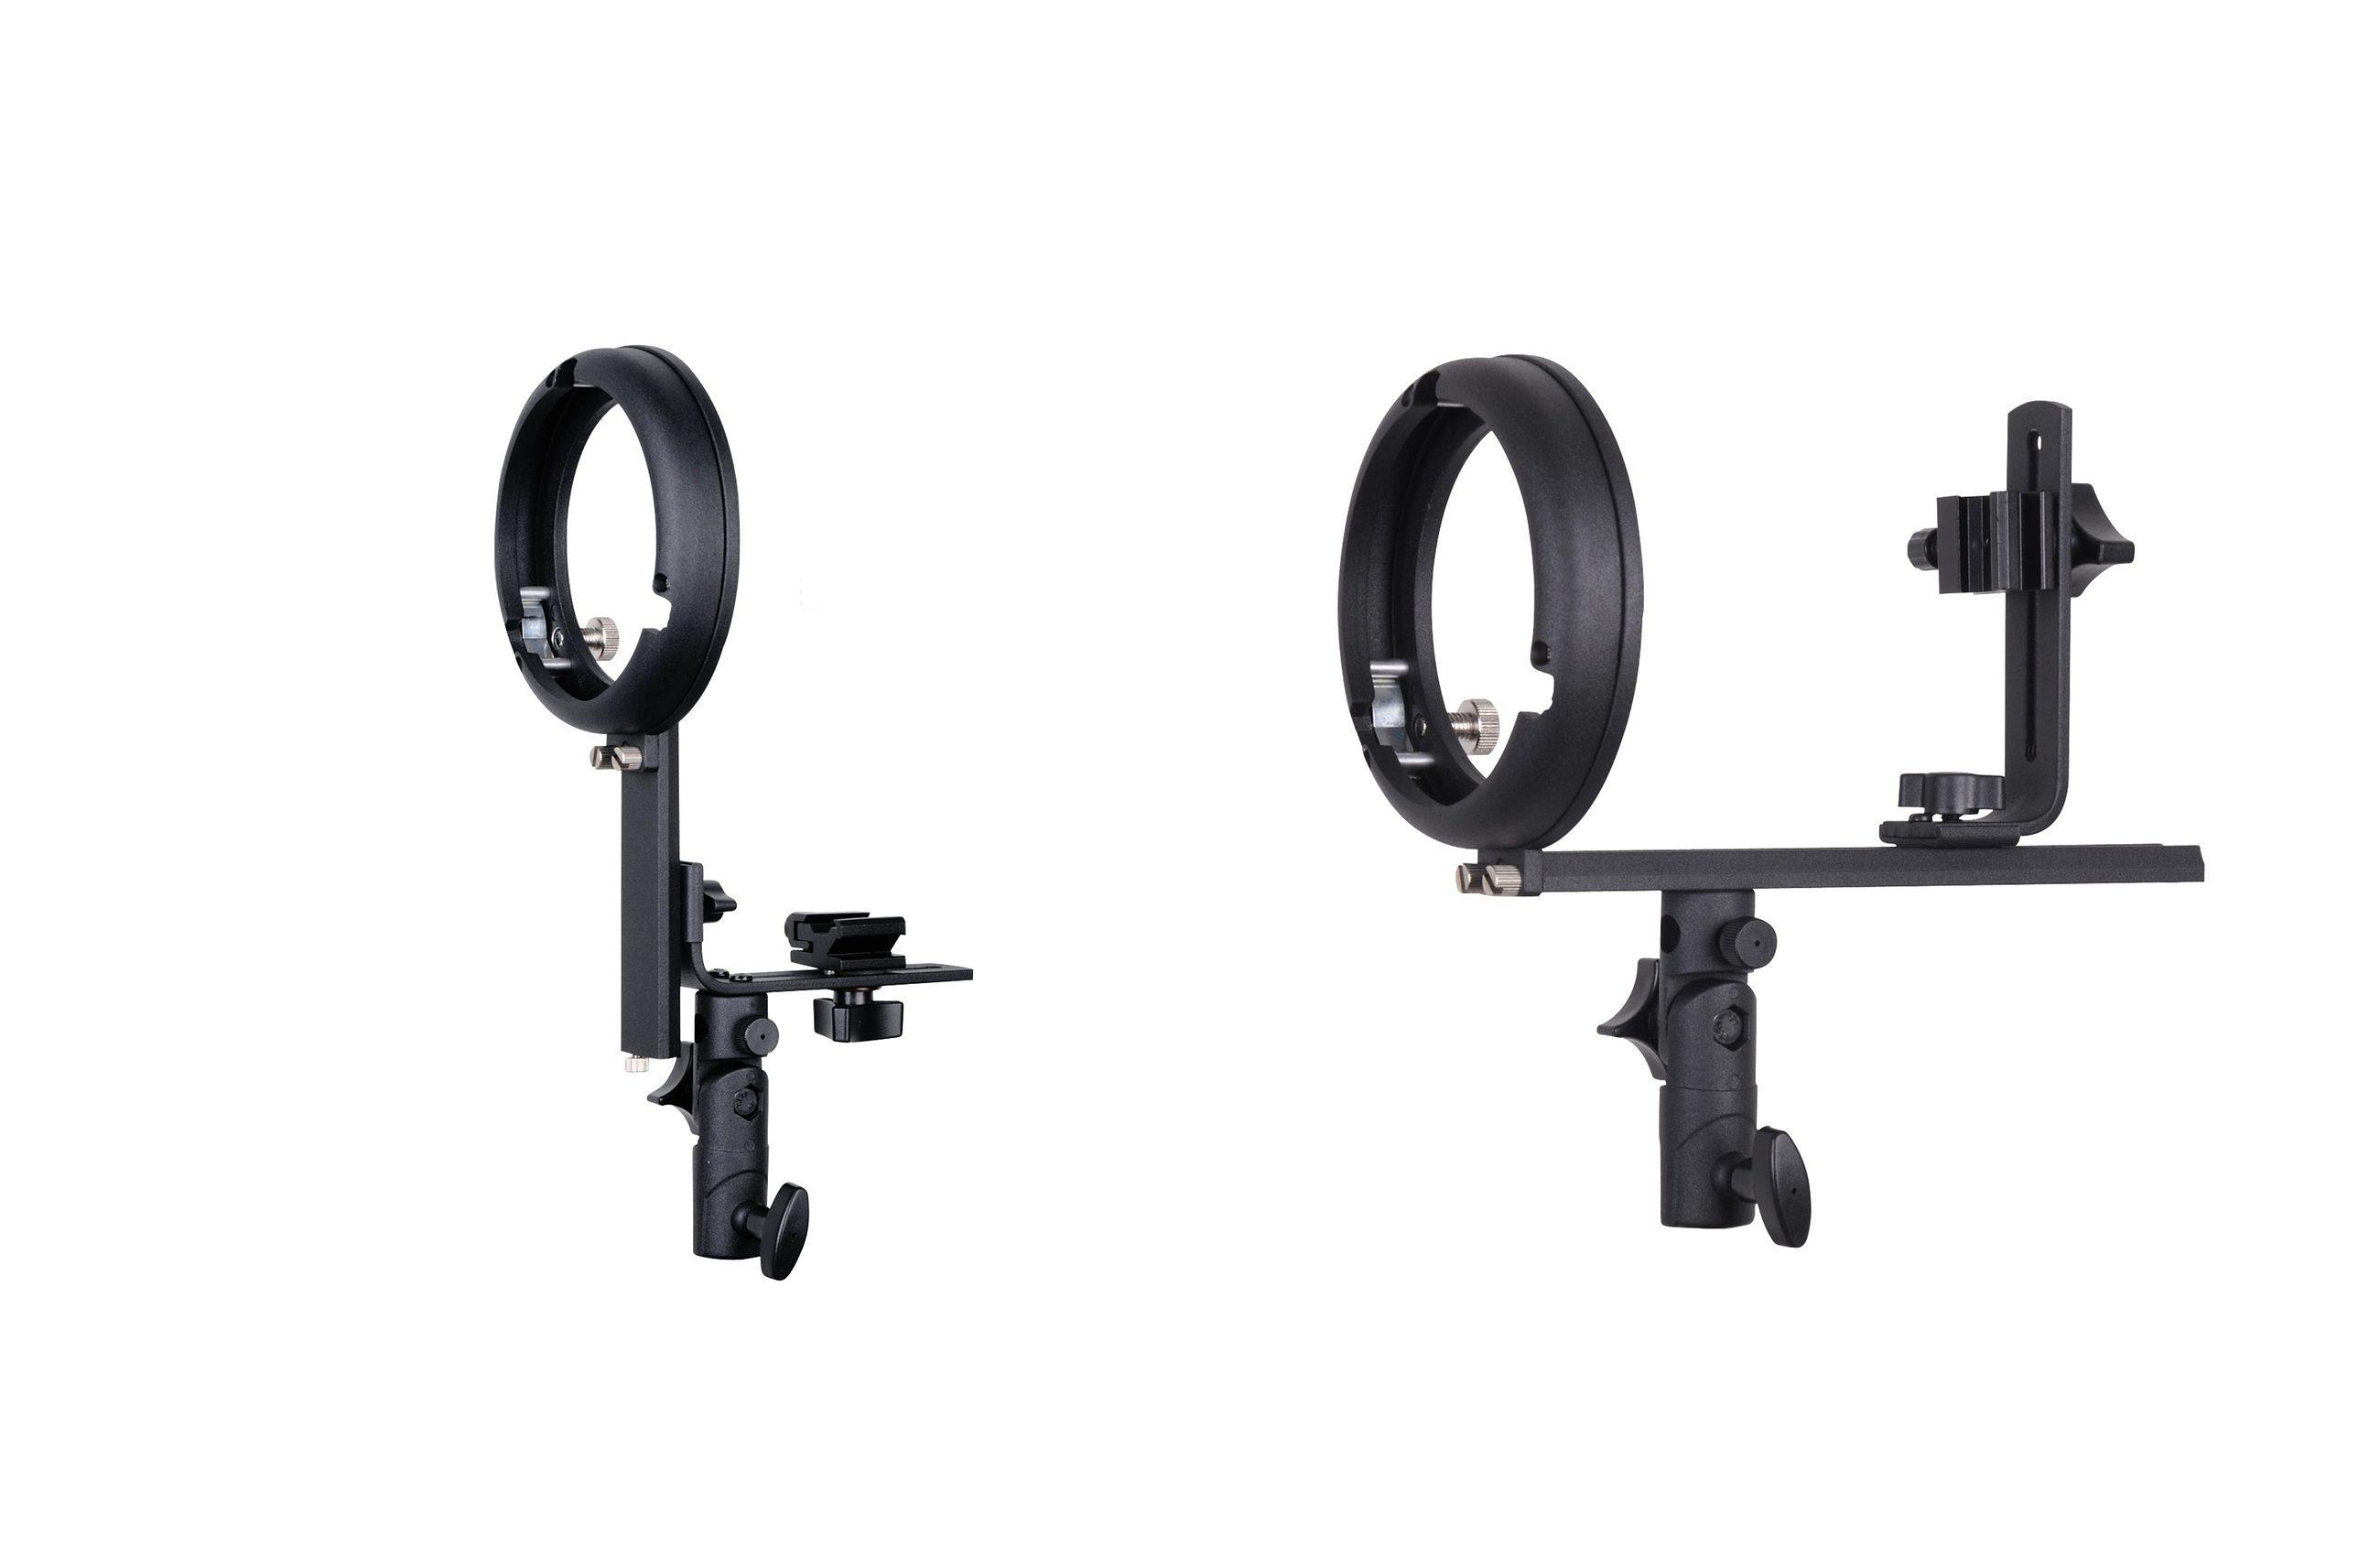 BRESSER Fotostudio »BRESSER Kamerablitzhalter mit S-Bajonett Adapter«